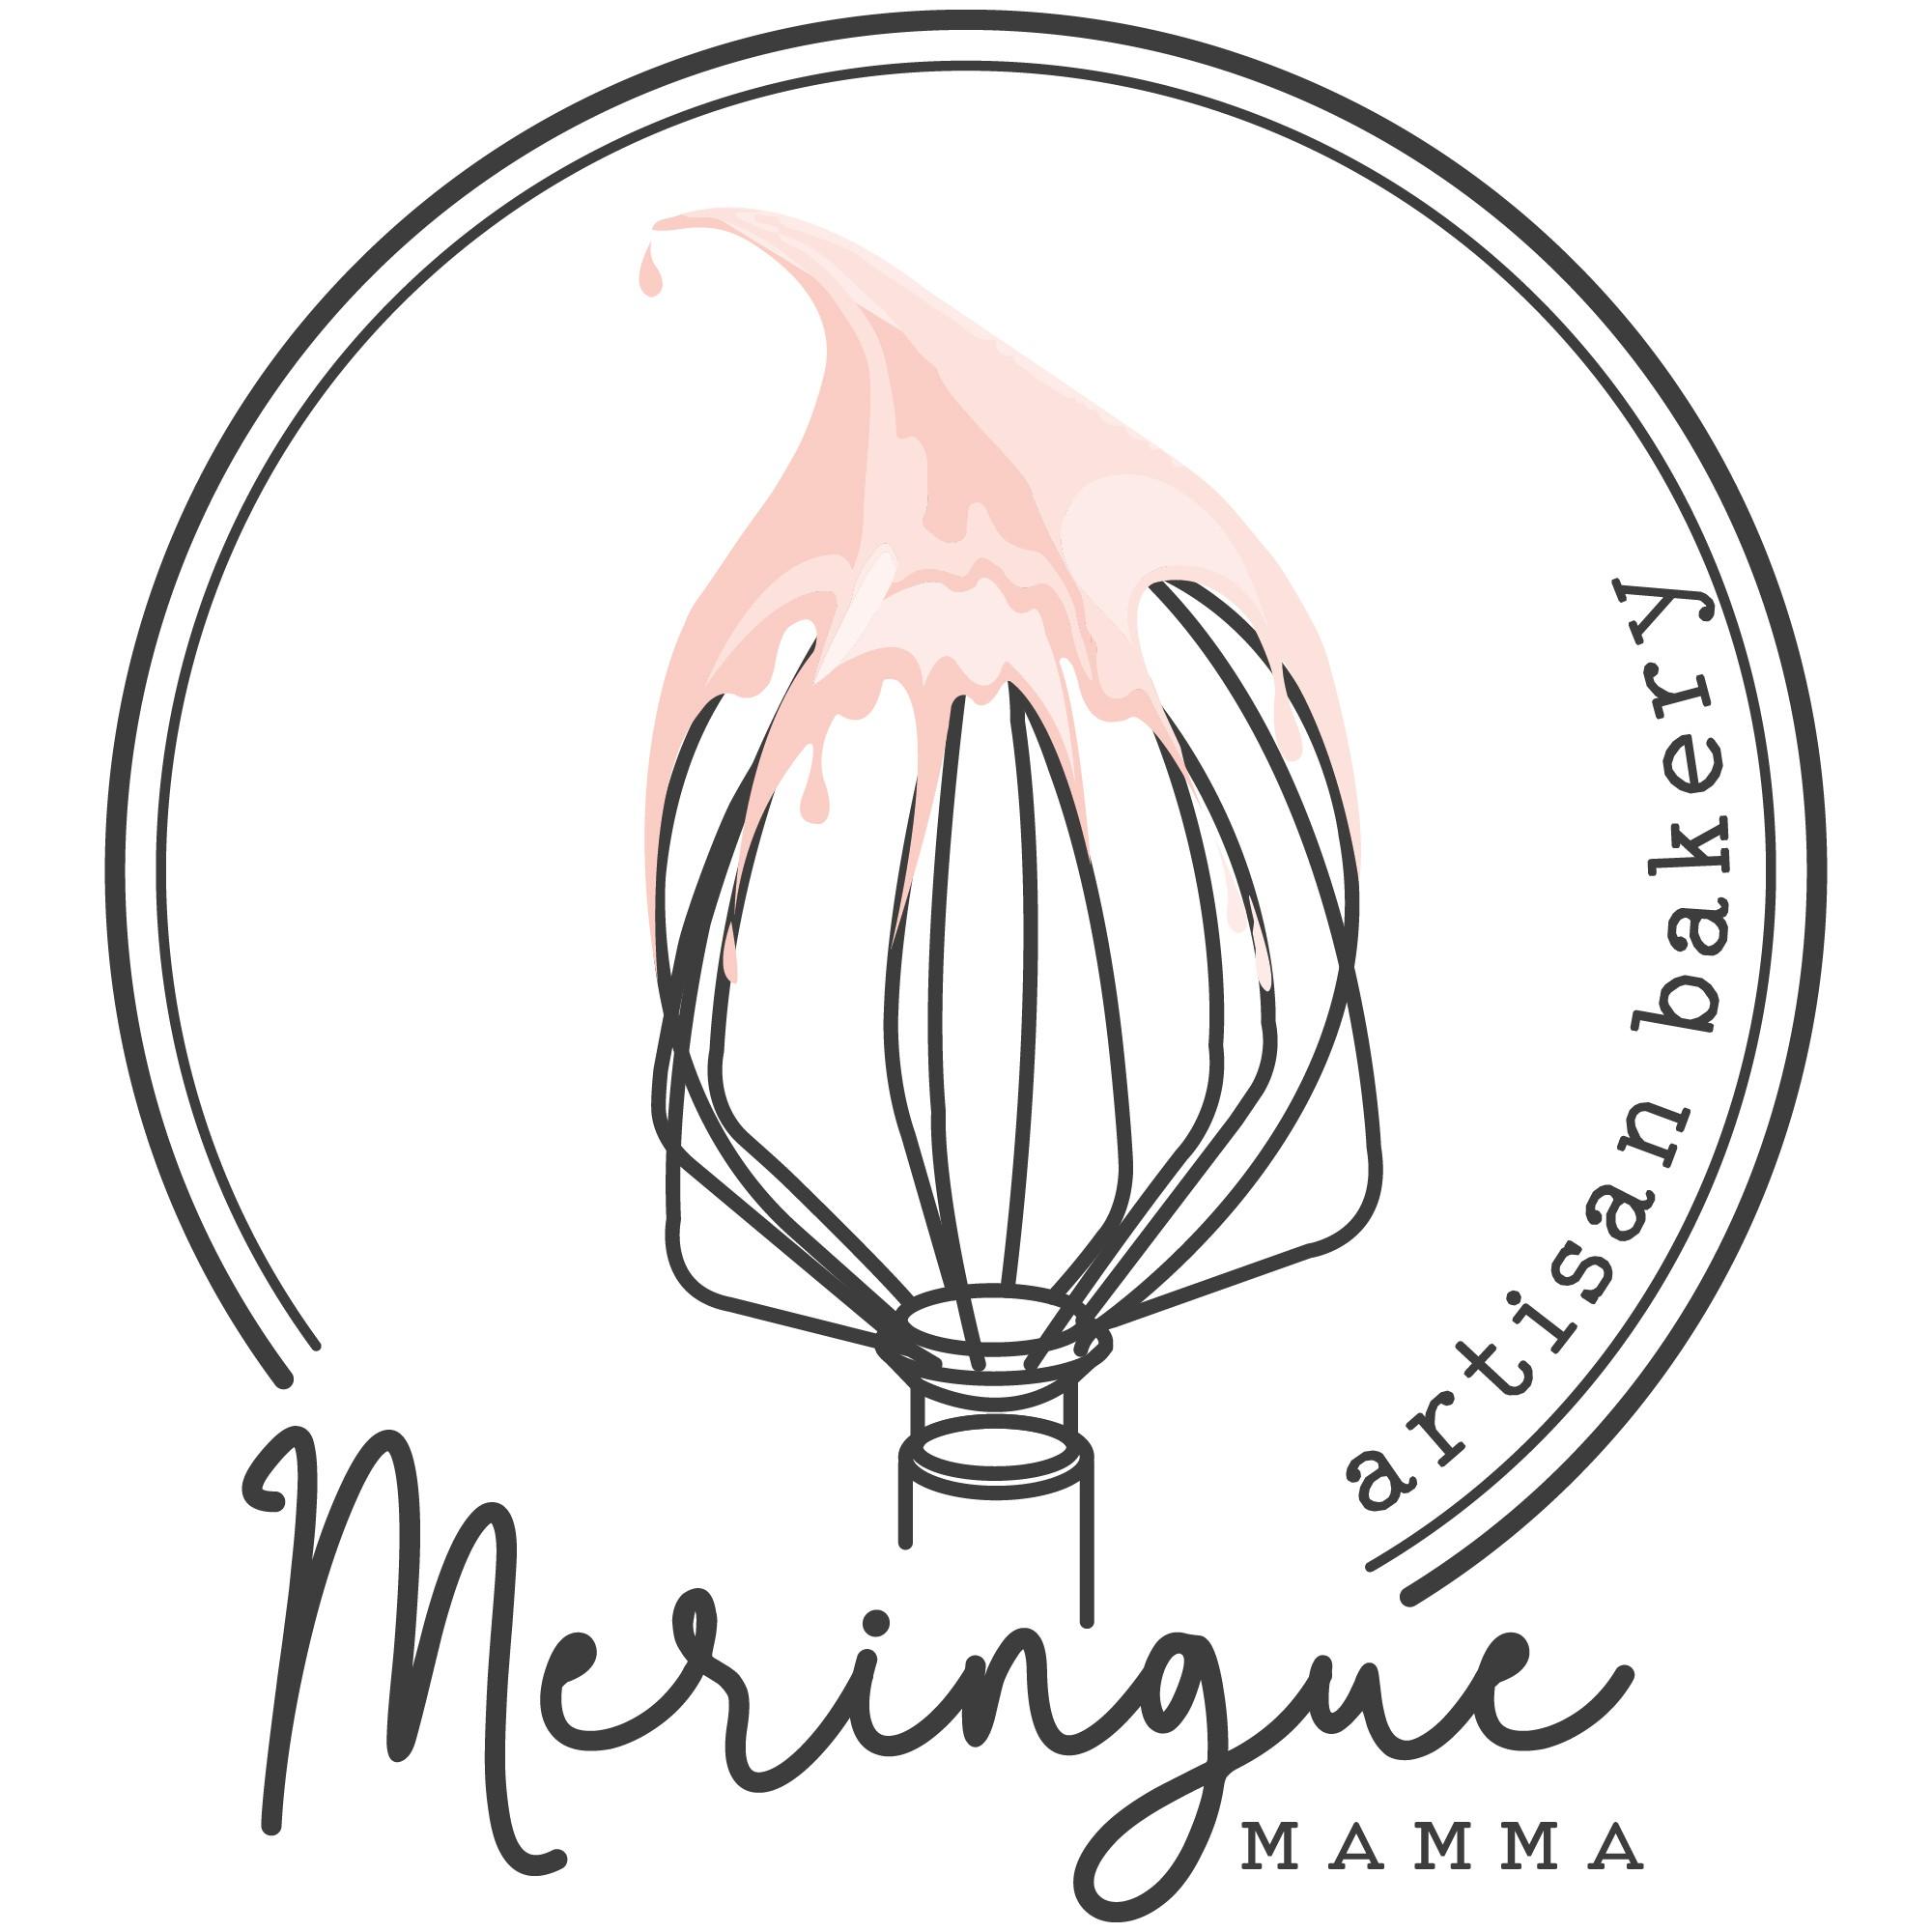 Meringue business needs an amazing new logo